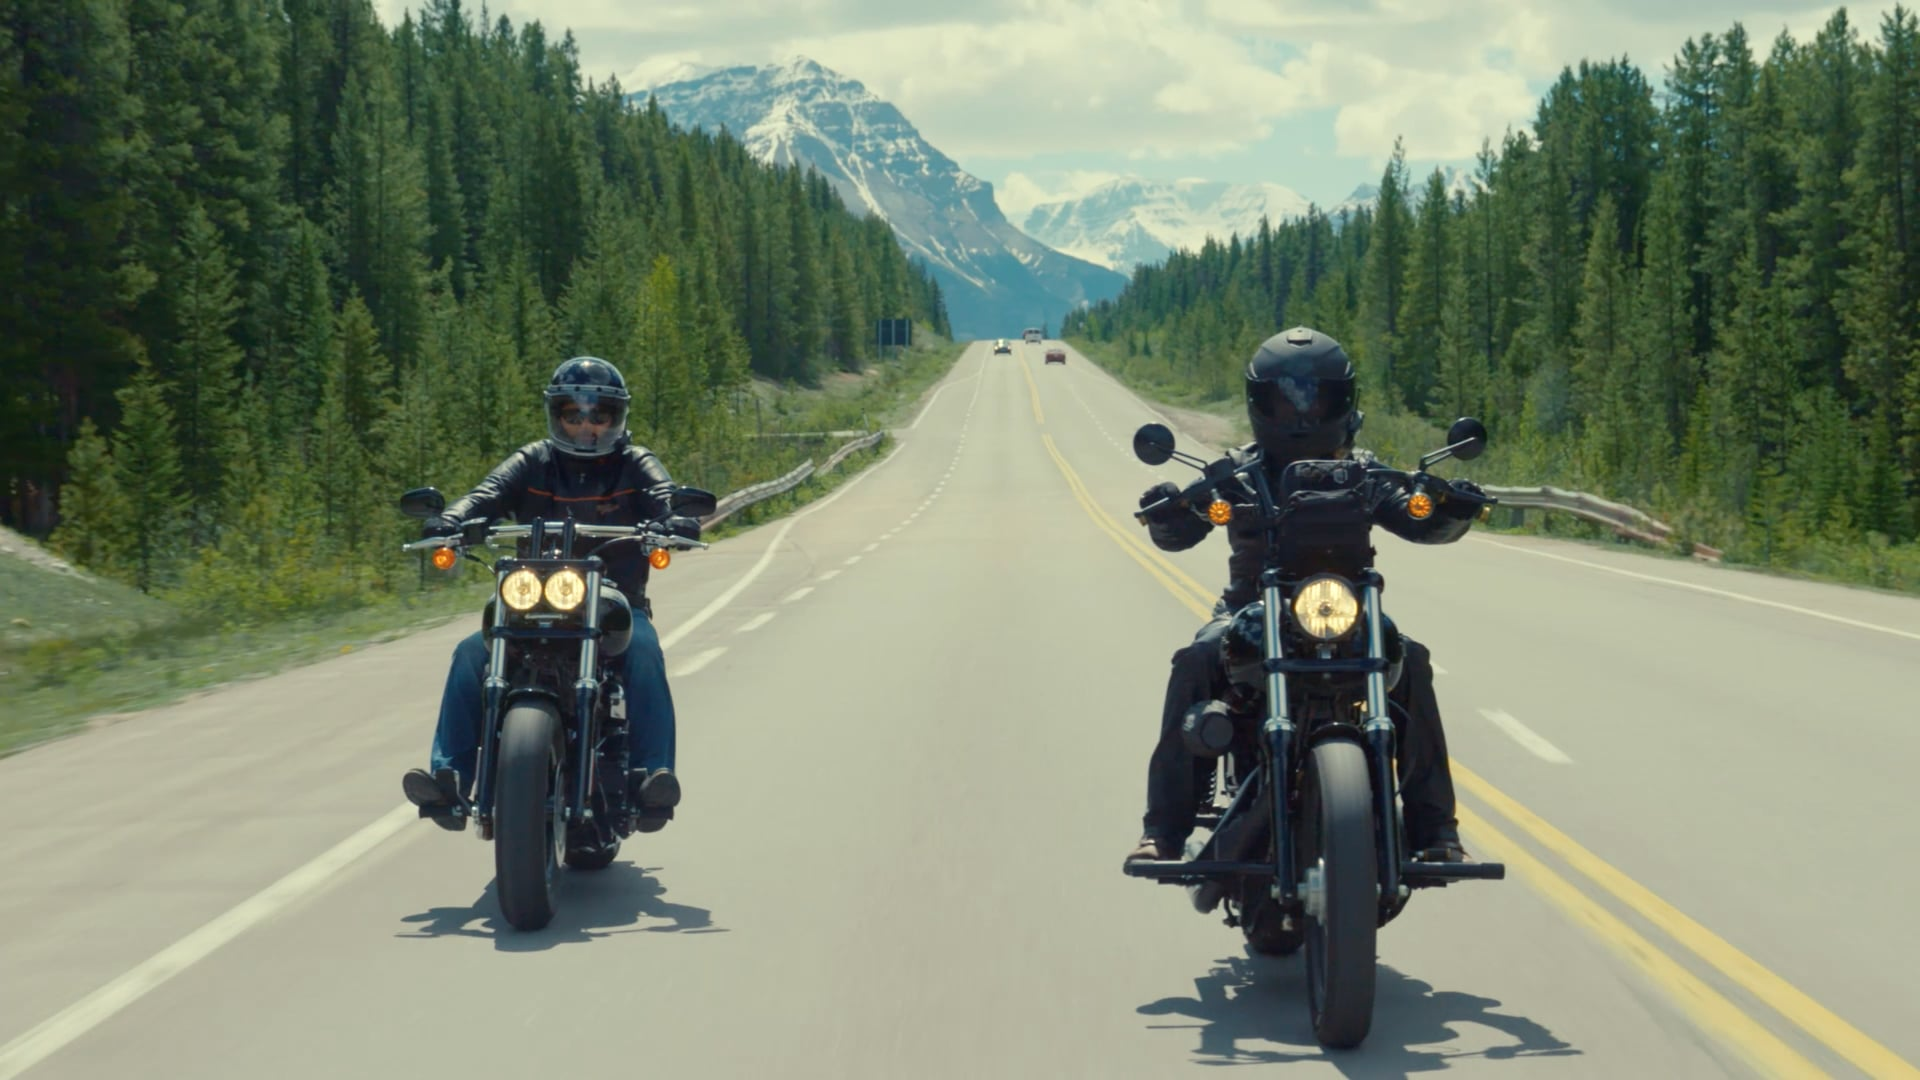 Harley Davidson: Common Ground